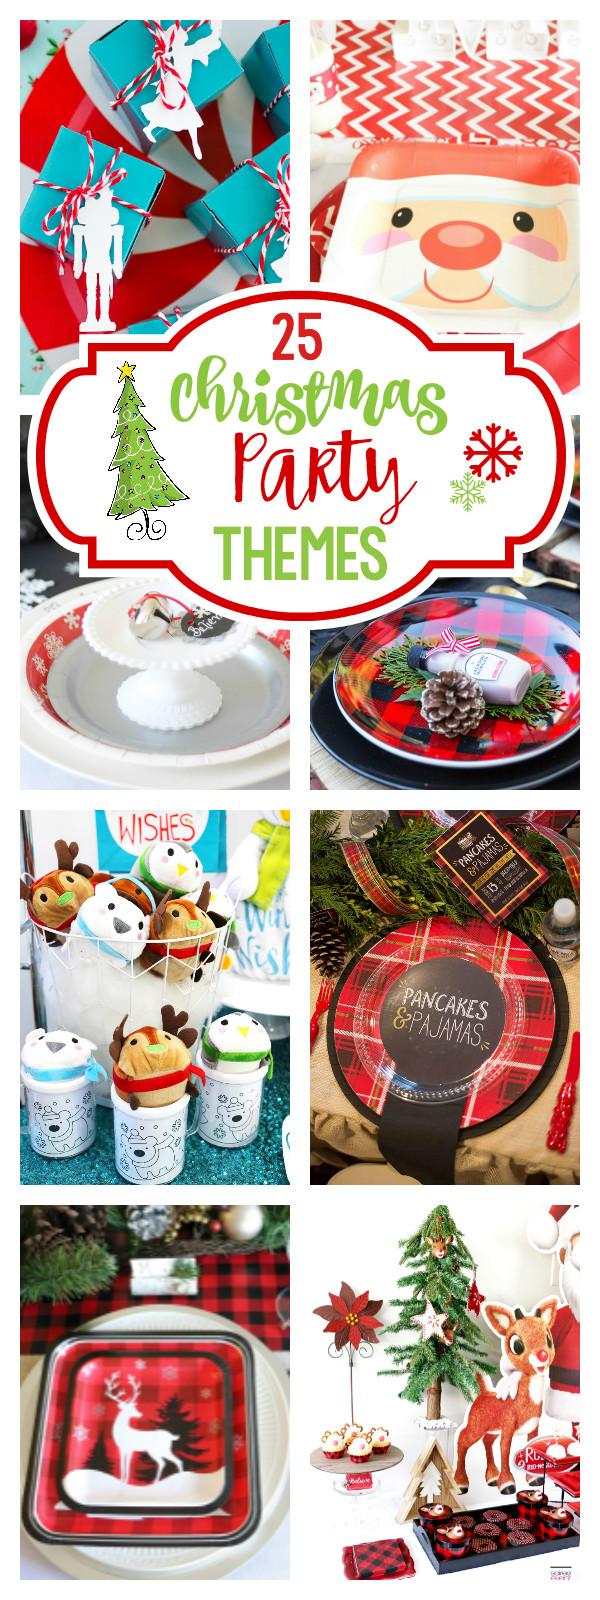 Adult Christmas Party Ideas  25 Fun Christmas Party Theme Ideas – Fun Squared